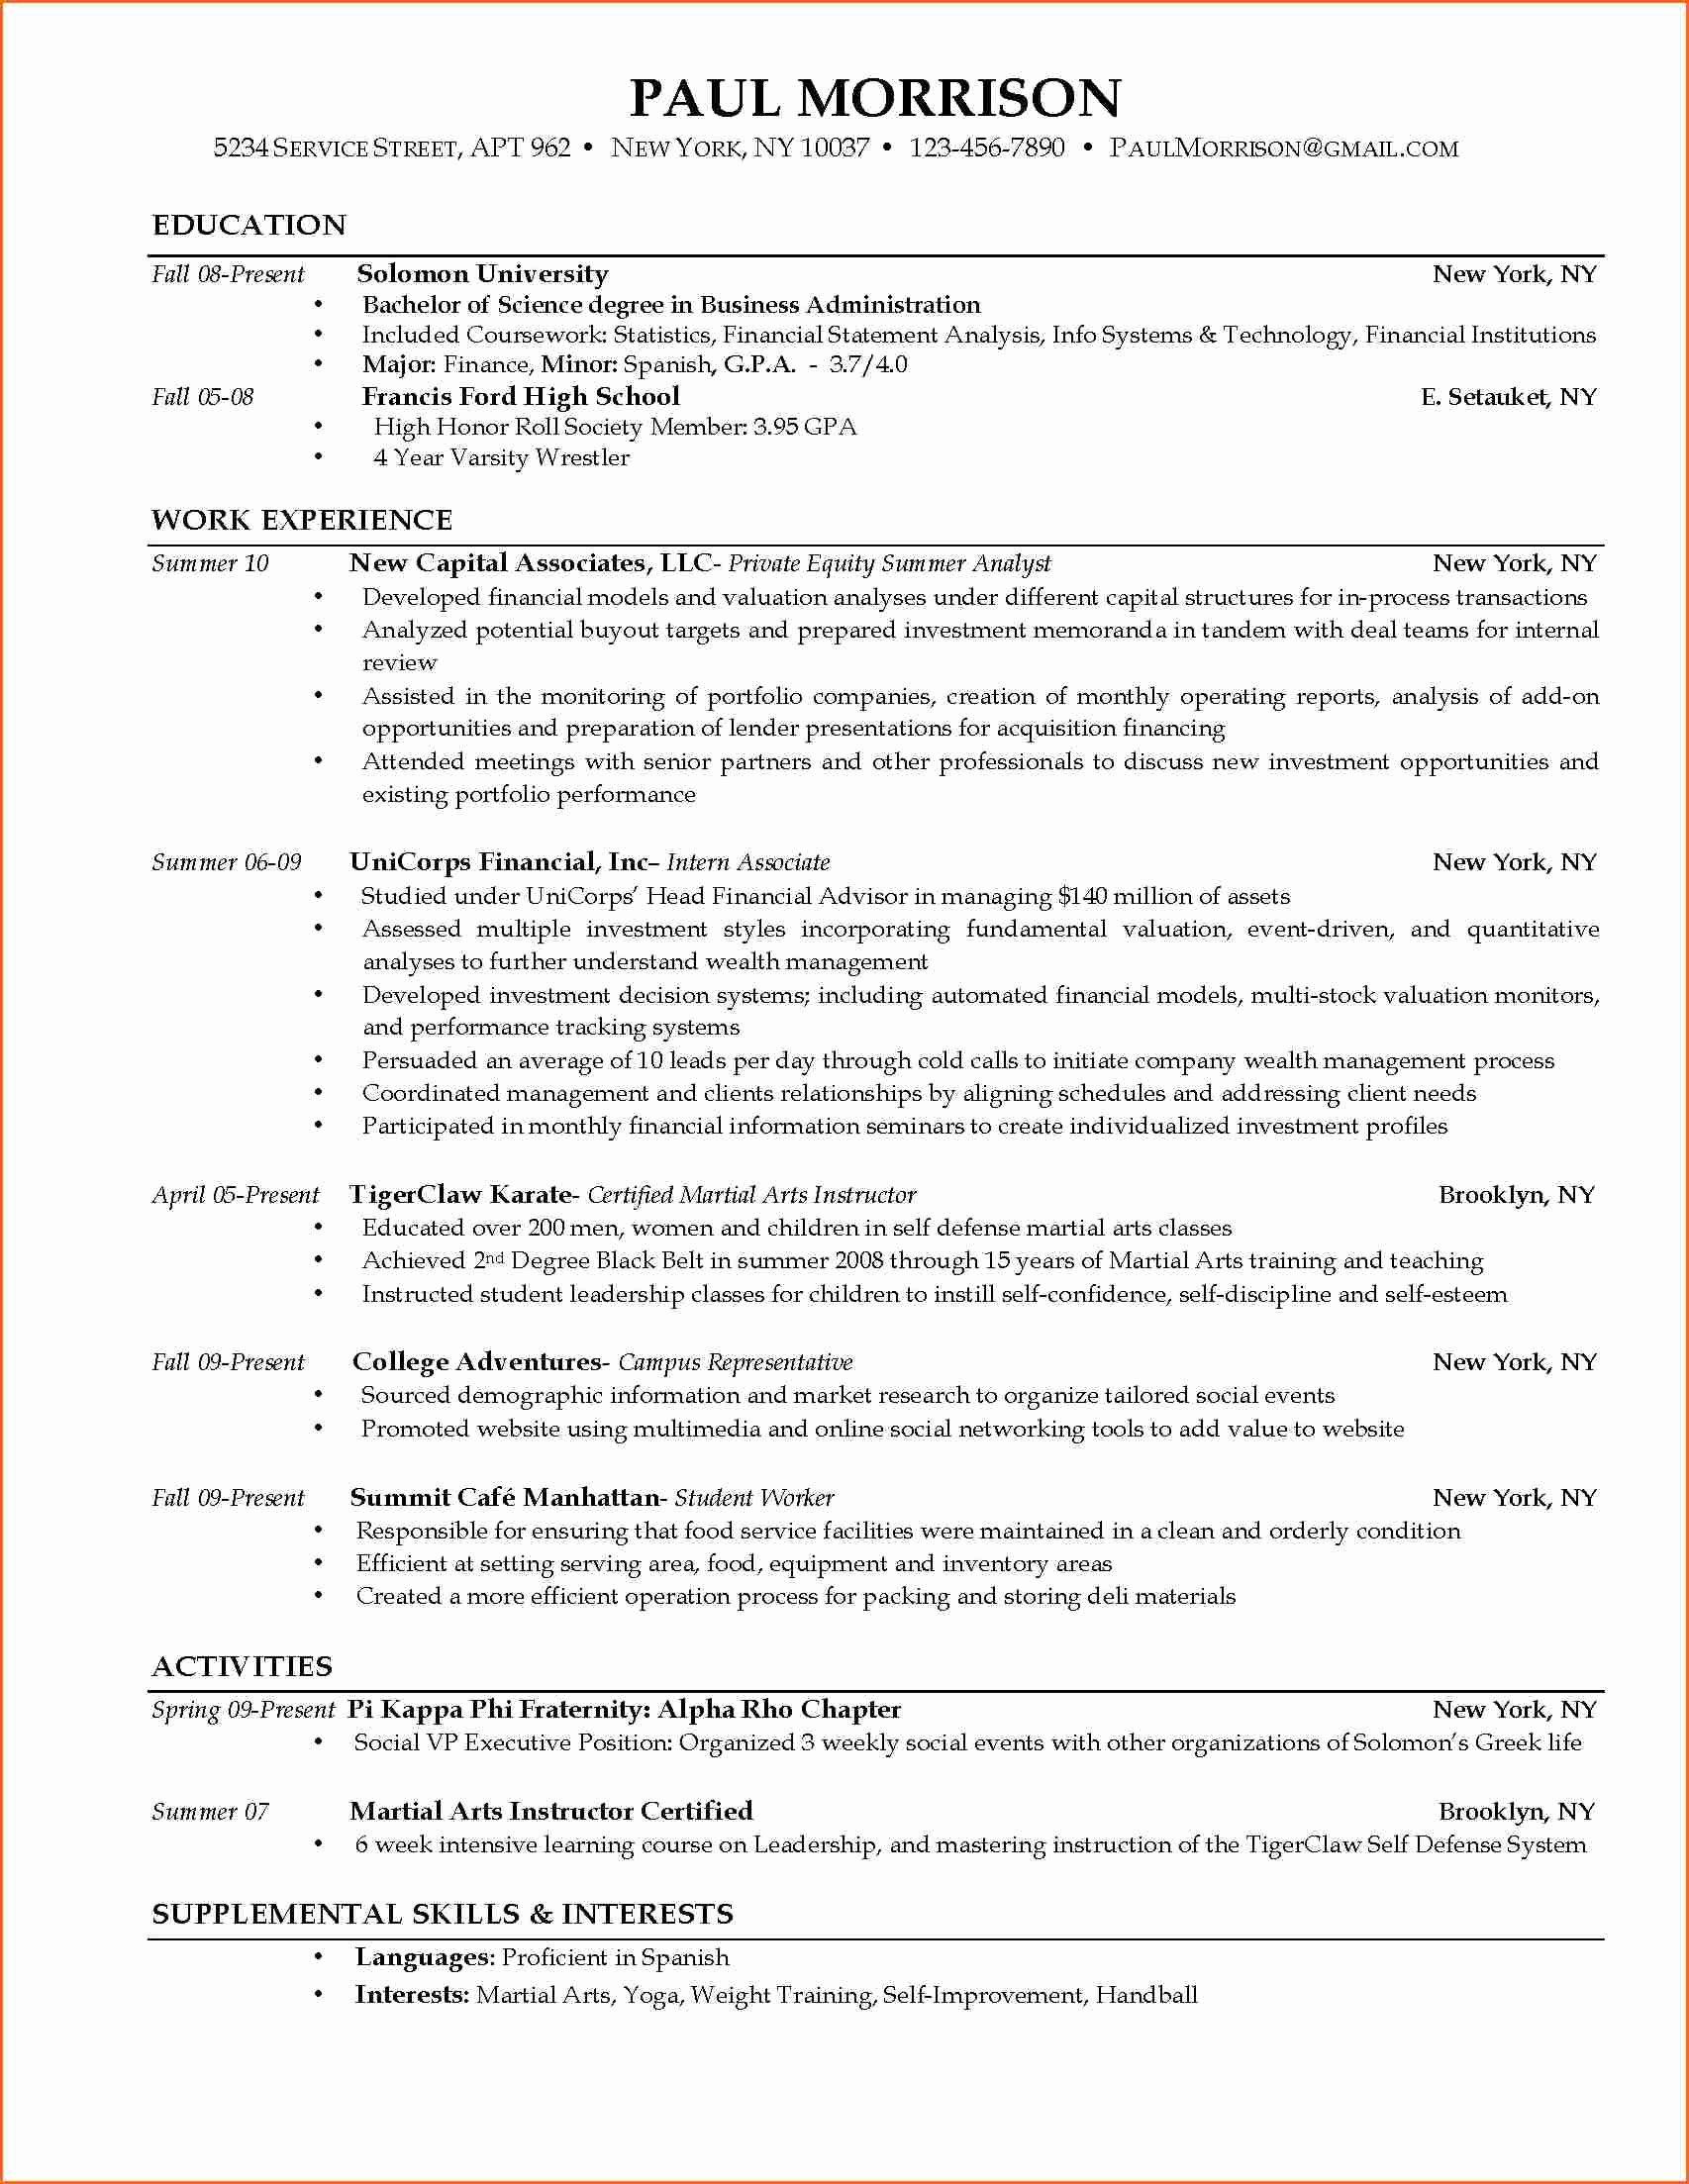 Resume Samples for College Student Elegant Current College Student Resume